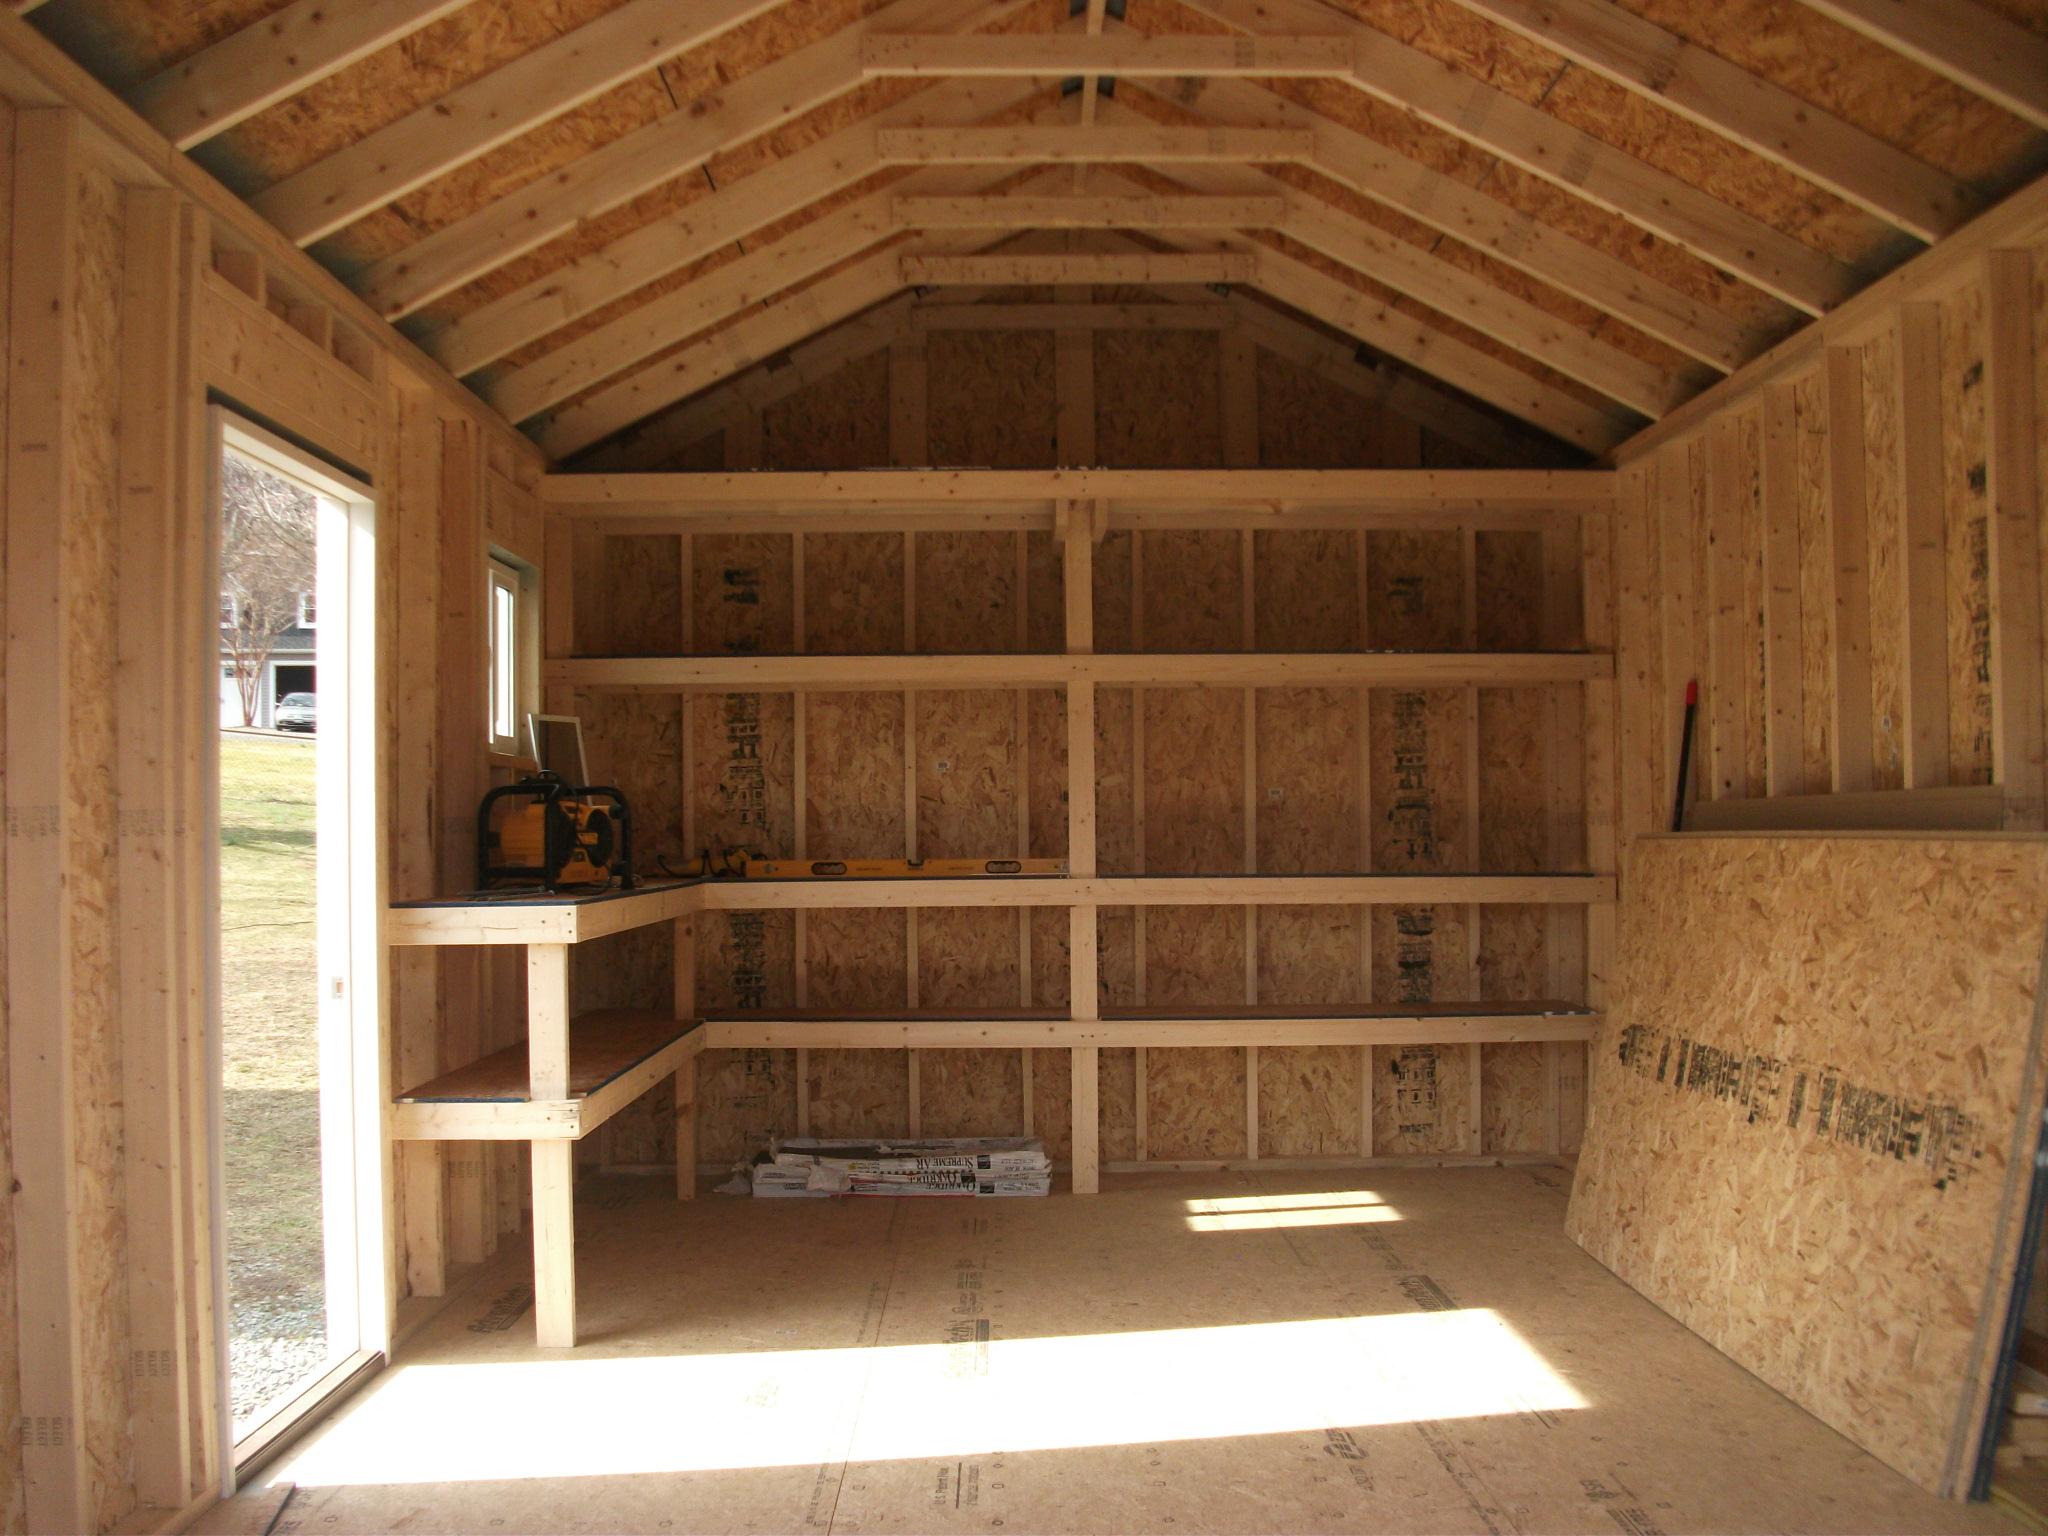 Crozet Shed Interior